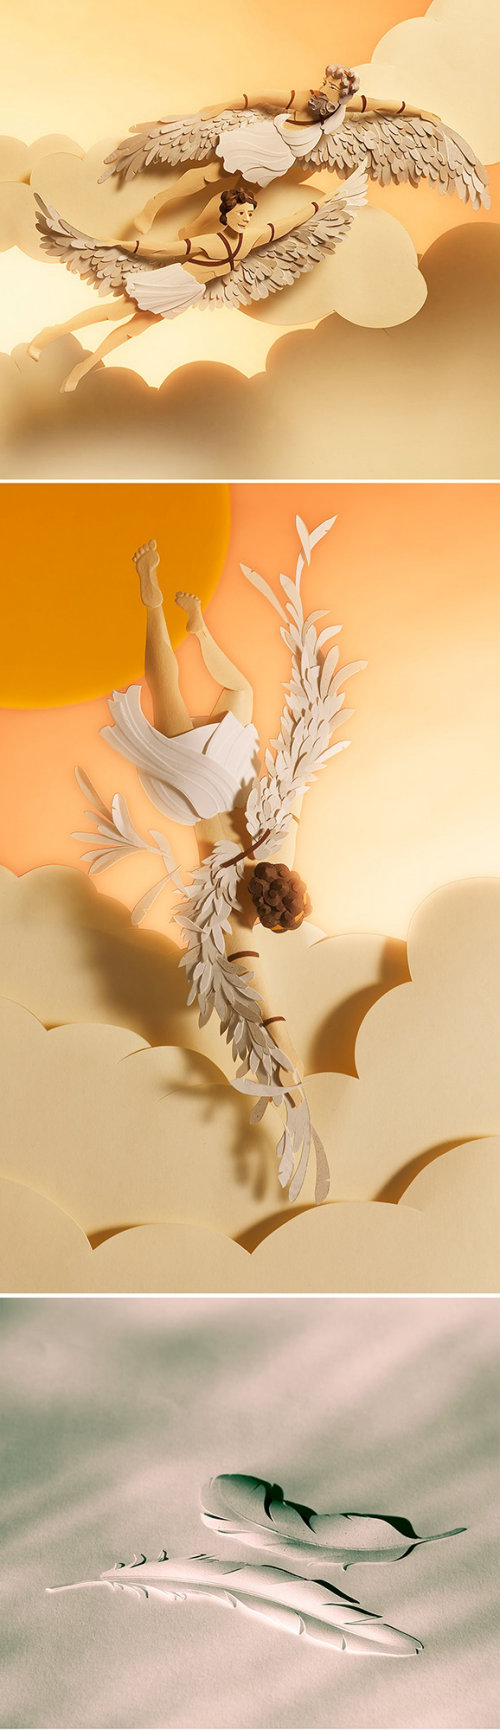 Paper art angels flying